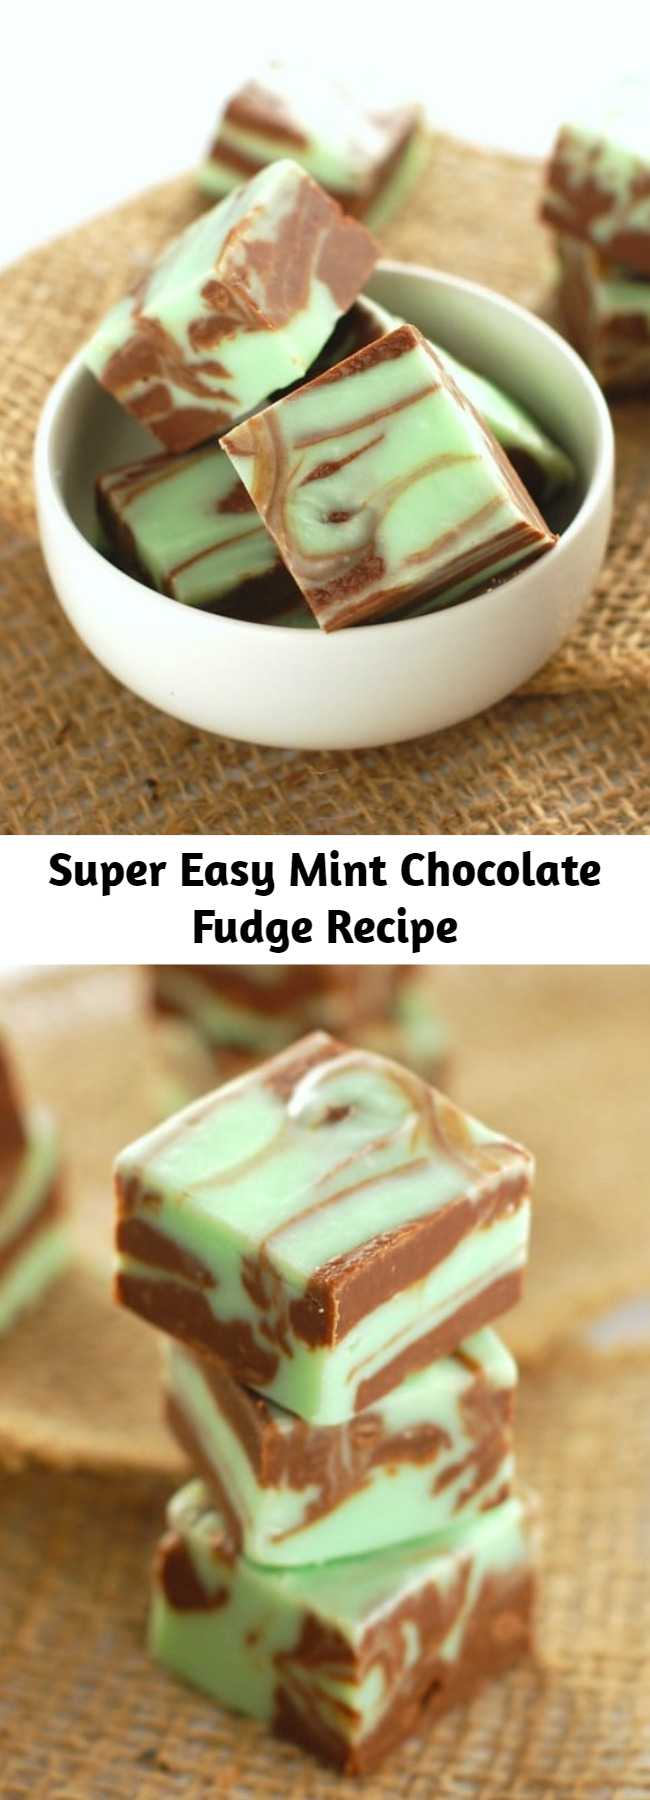 Super Easy Mint Chocolate Fudge Recipe - A simple fudge recipe that looks fancy and tastes amazing!